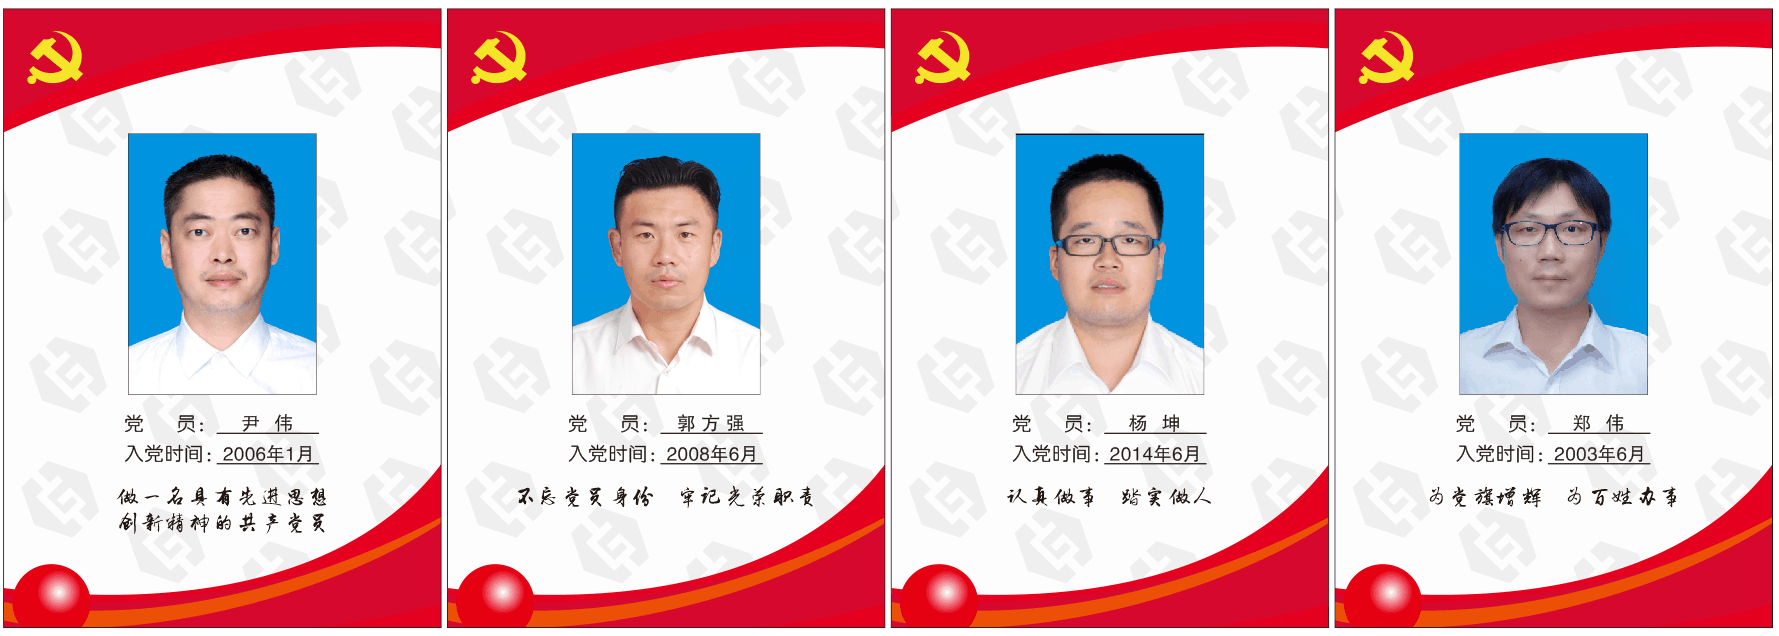 QQ图片20181206152943.png